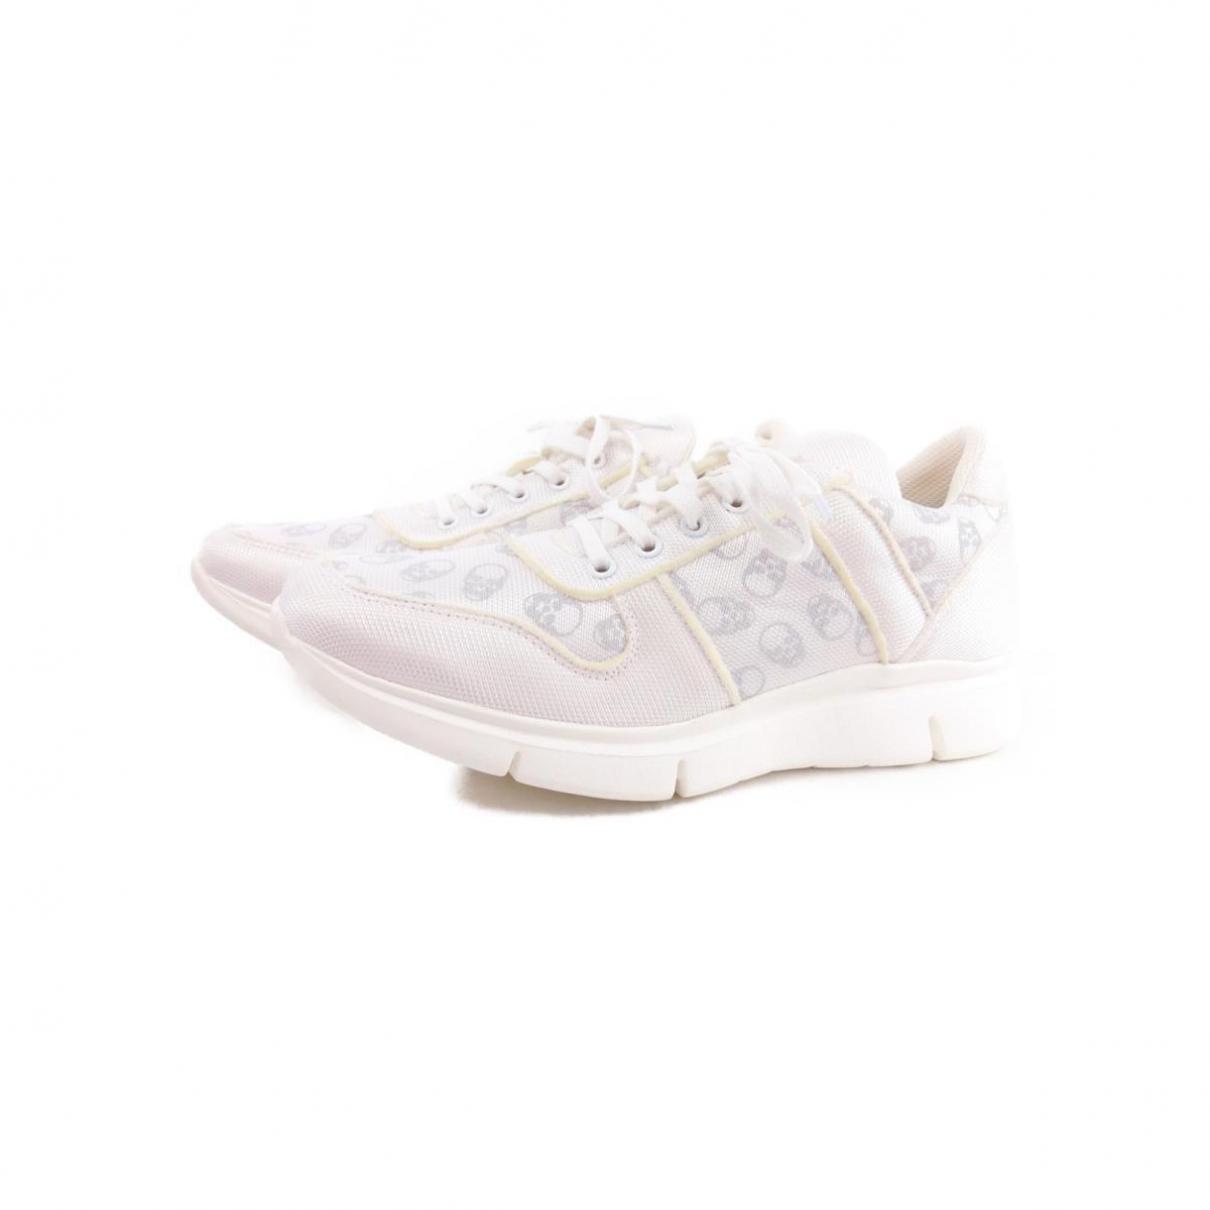 Lucien Pellat Finet \N Sneakers in  Weiss Leder